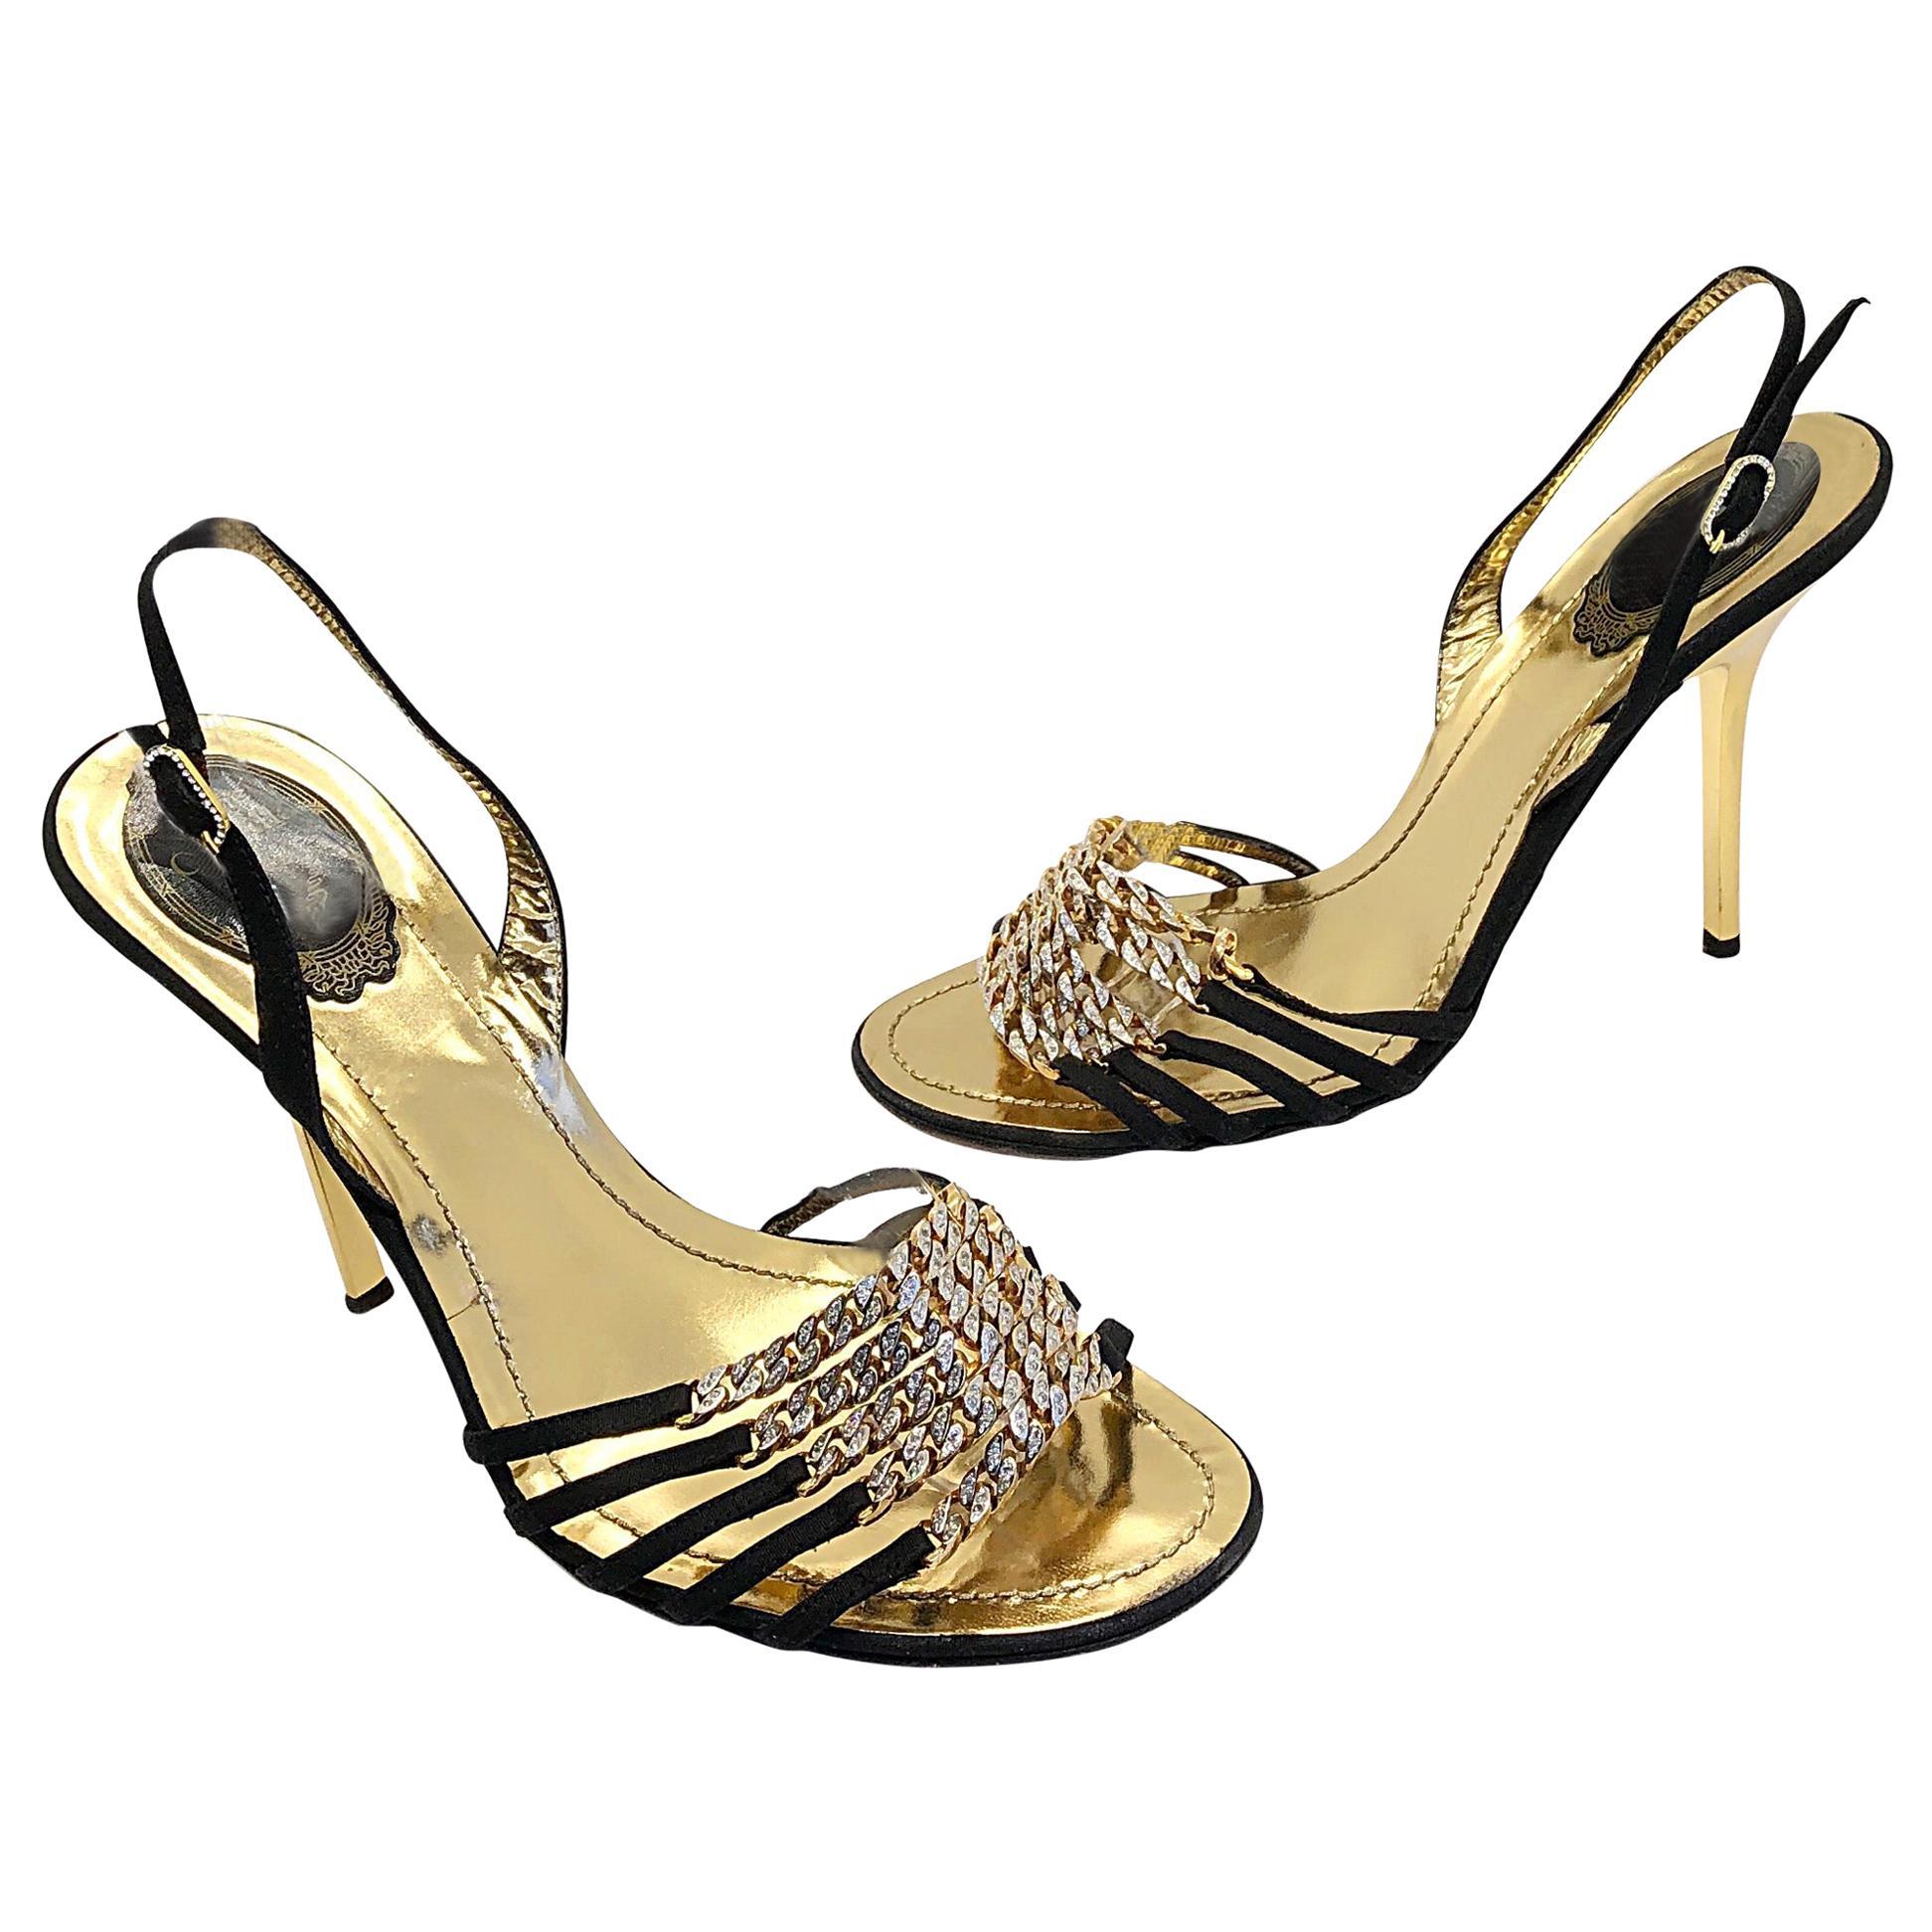 Rene Caovilla Size 38.5 / 8.5 Black + Gold Rhinestone Strappy High Heels Shoes